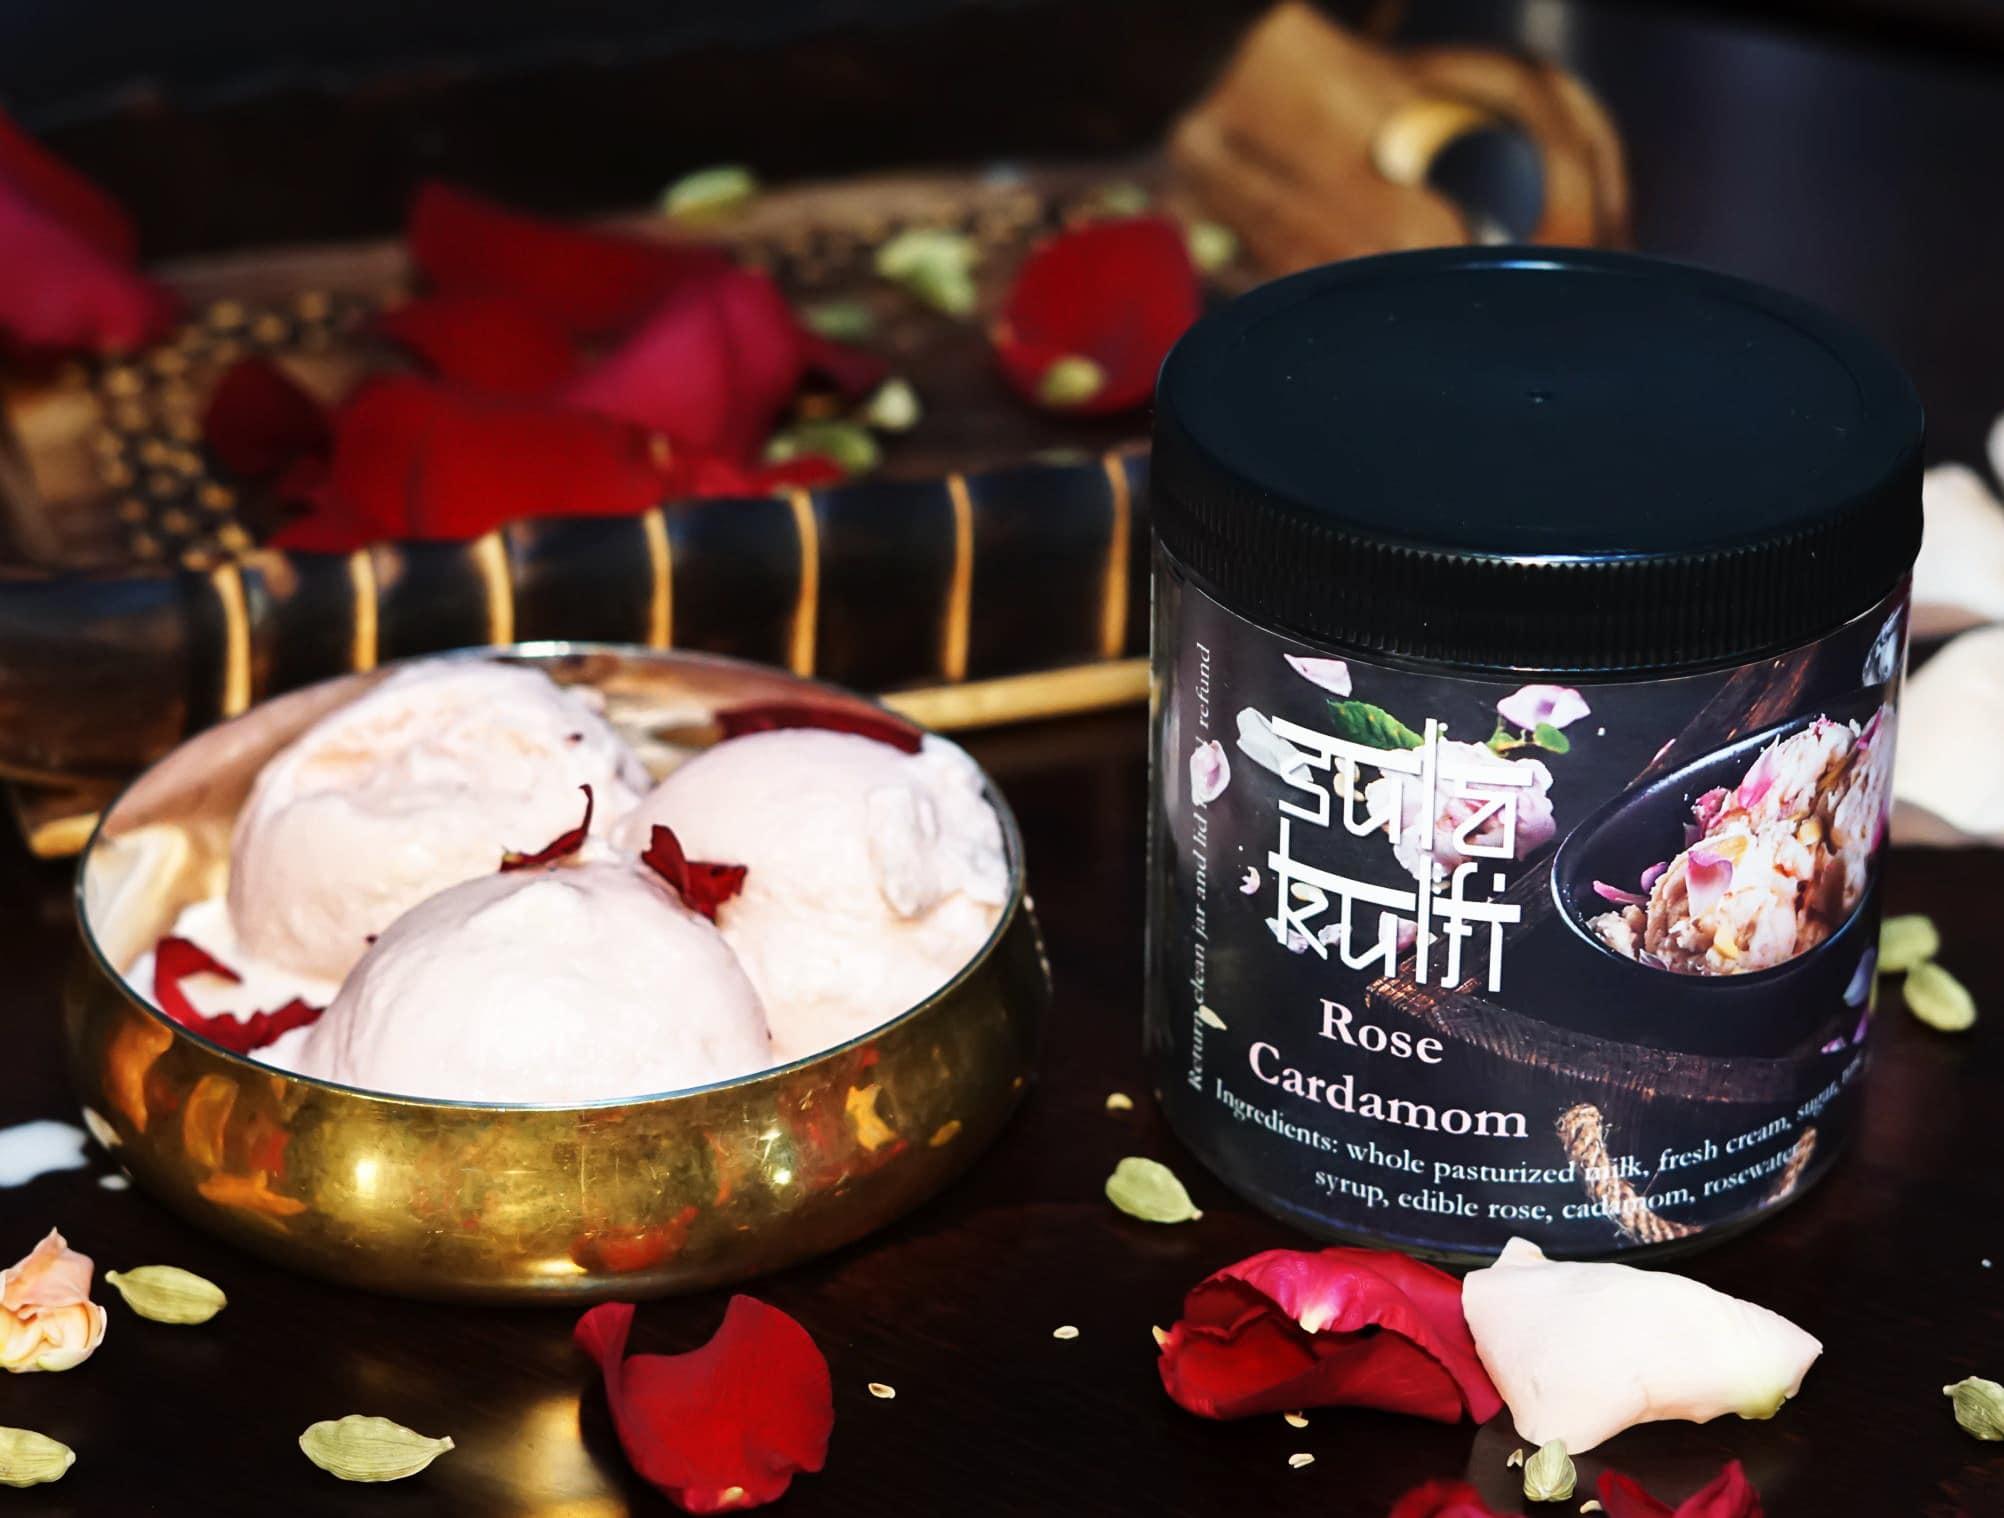 Rose Cardamom Kulfi Ice-cream